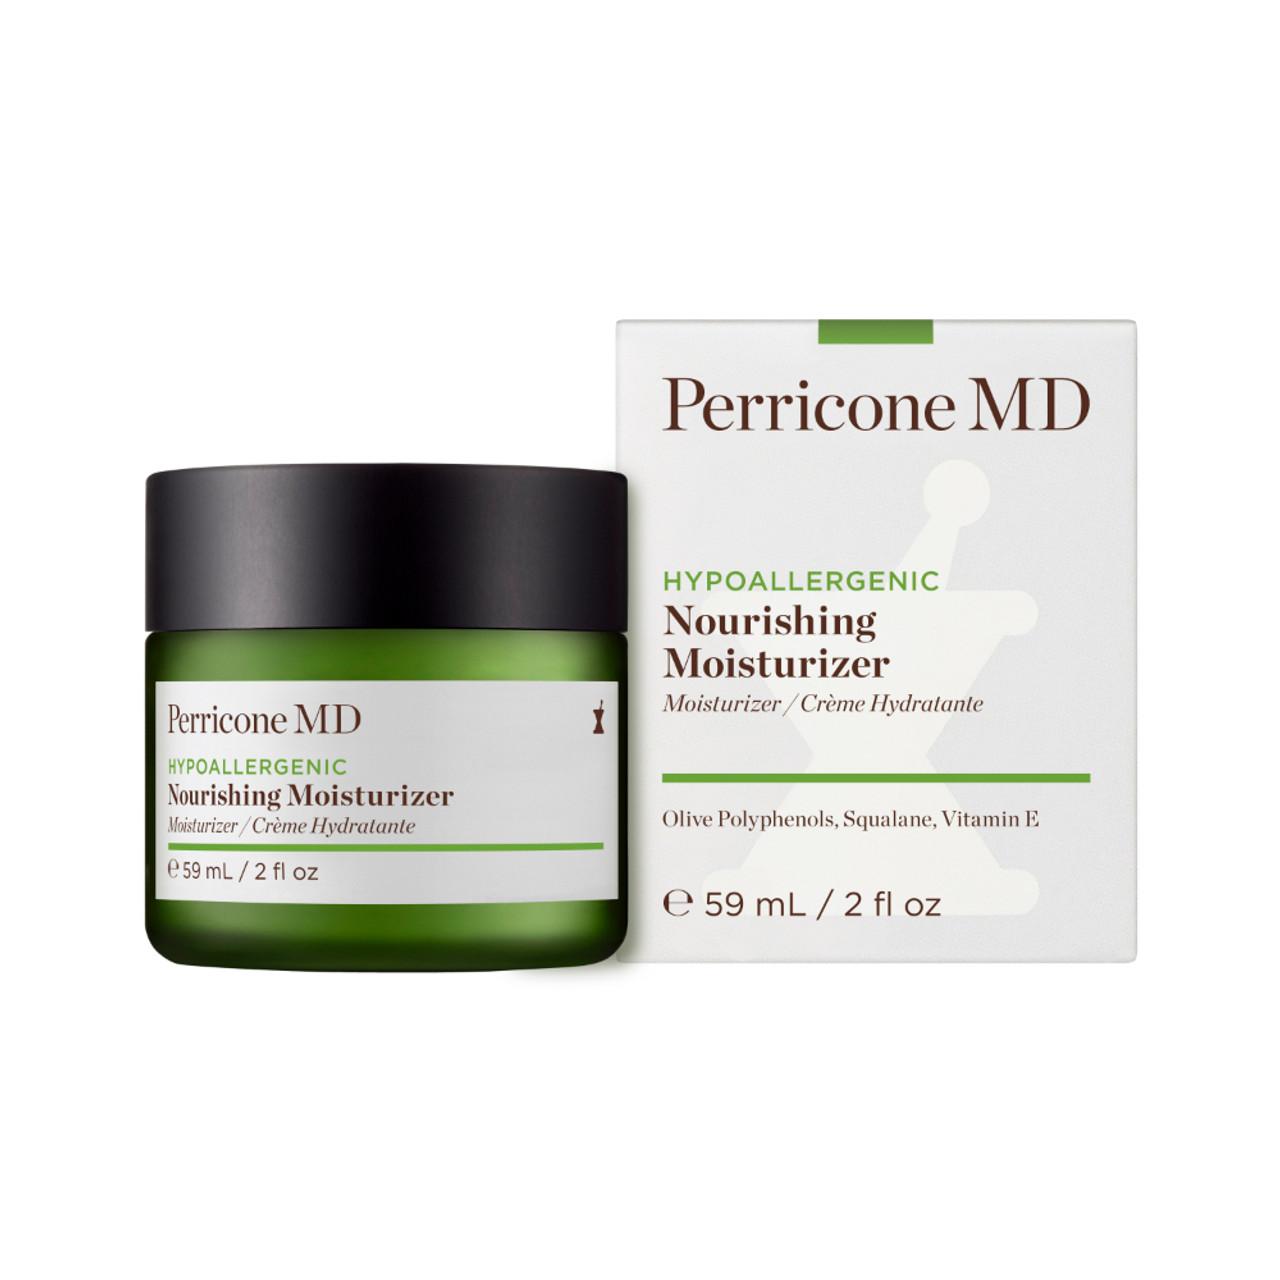 Perricone MD Hypoallergenic Nourishing Moisturizer No Cap